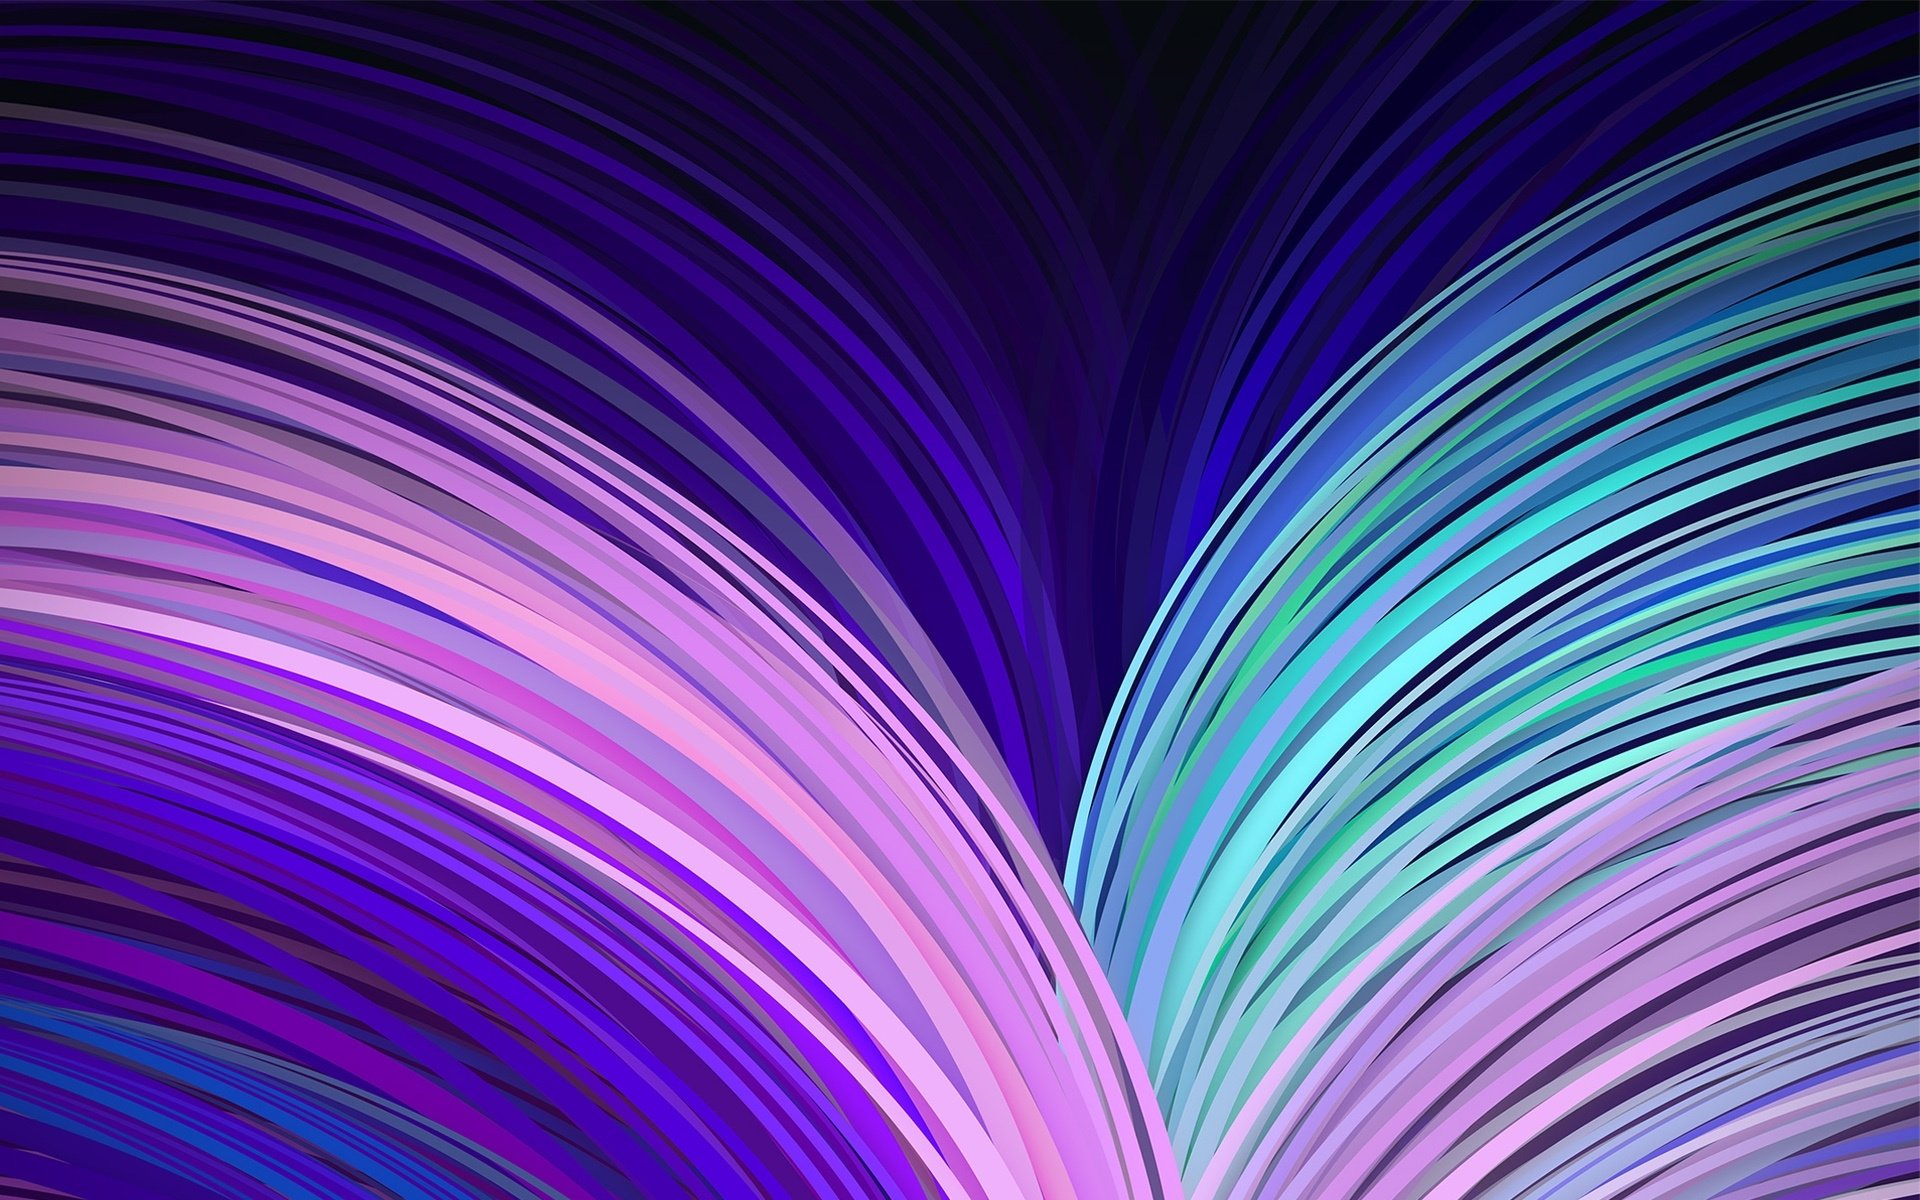 galaxy wallpaper hd purple